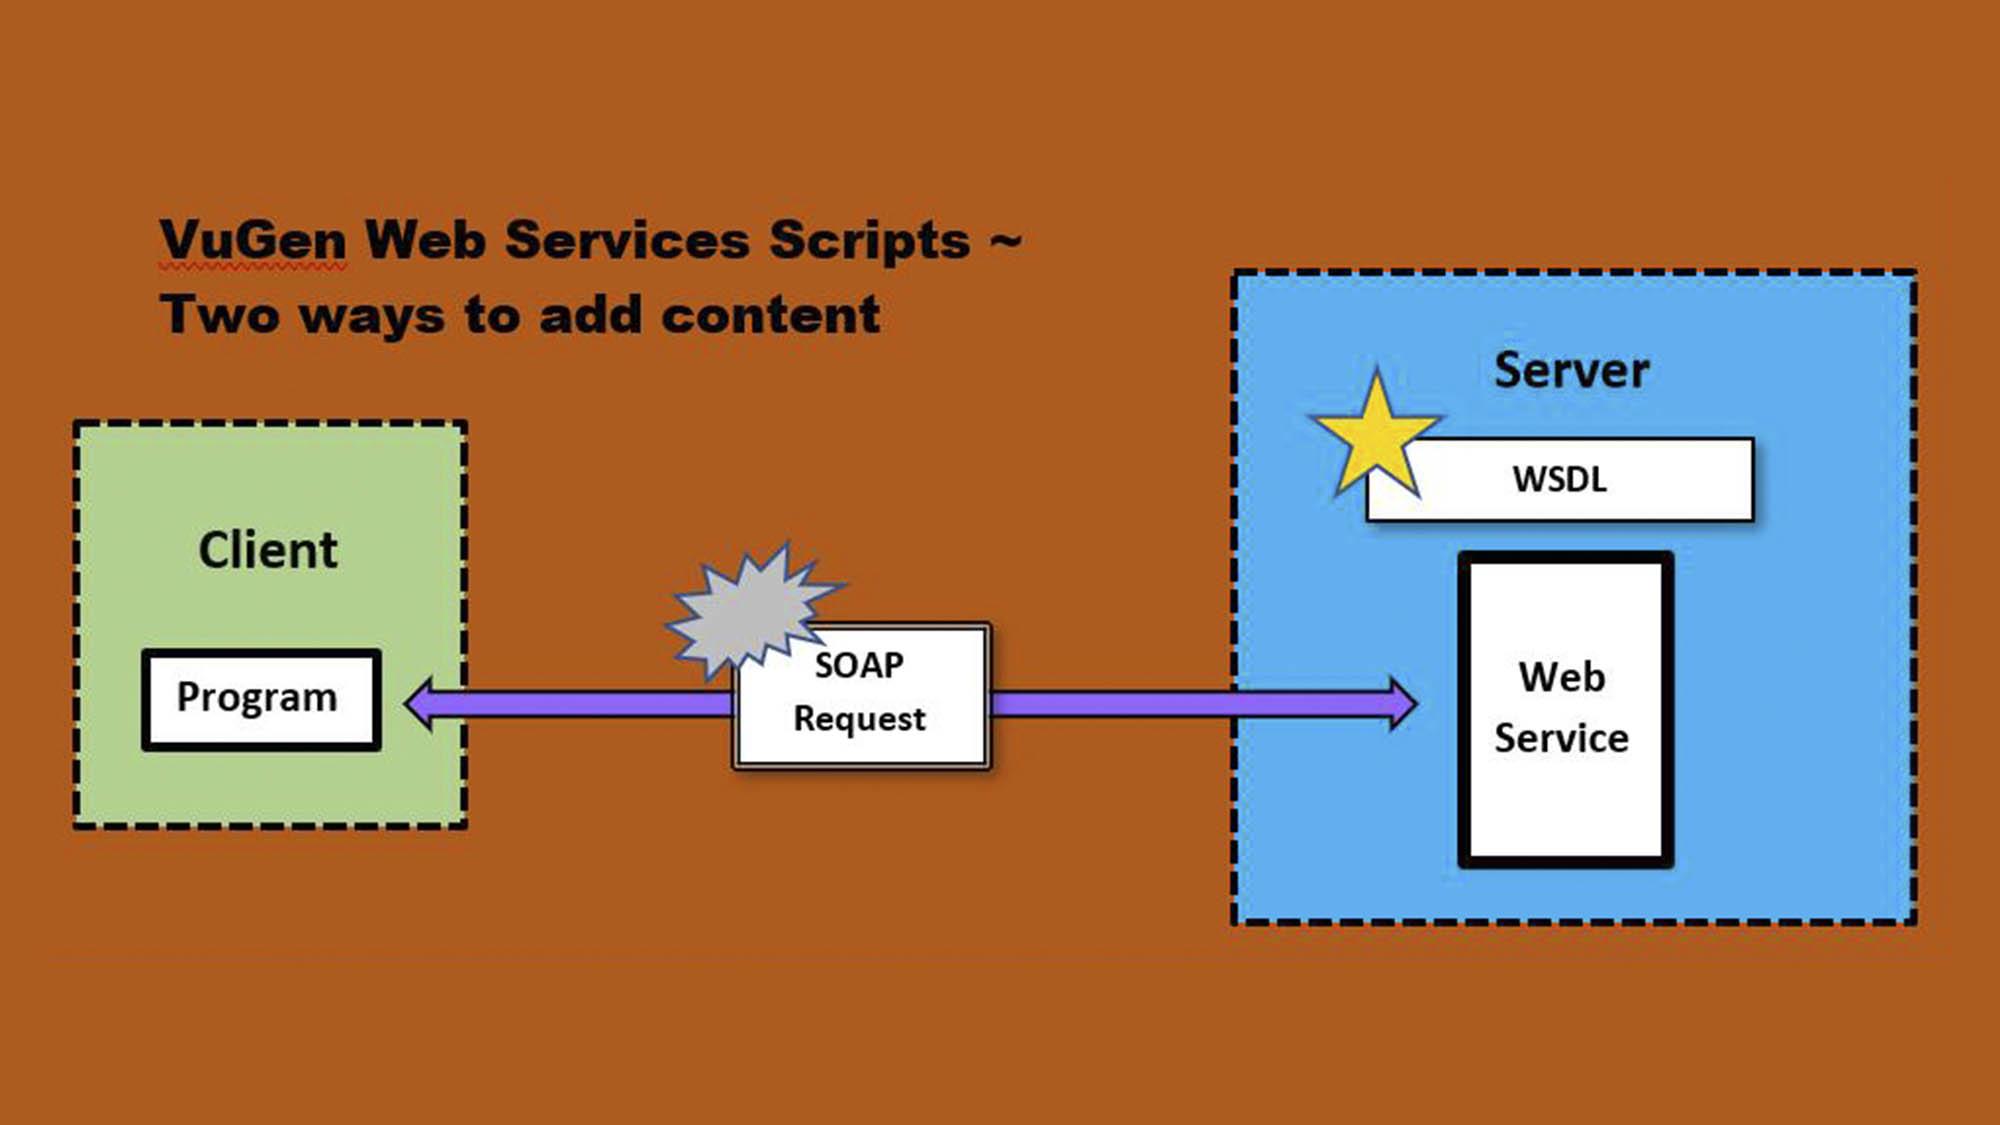 Micro Focus VuGen Web Services ~ Being an Effective Student